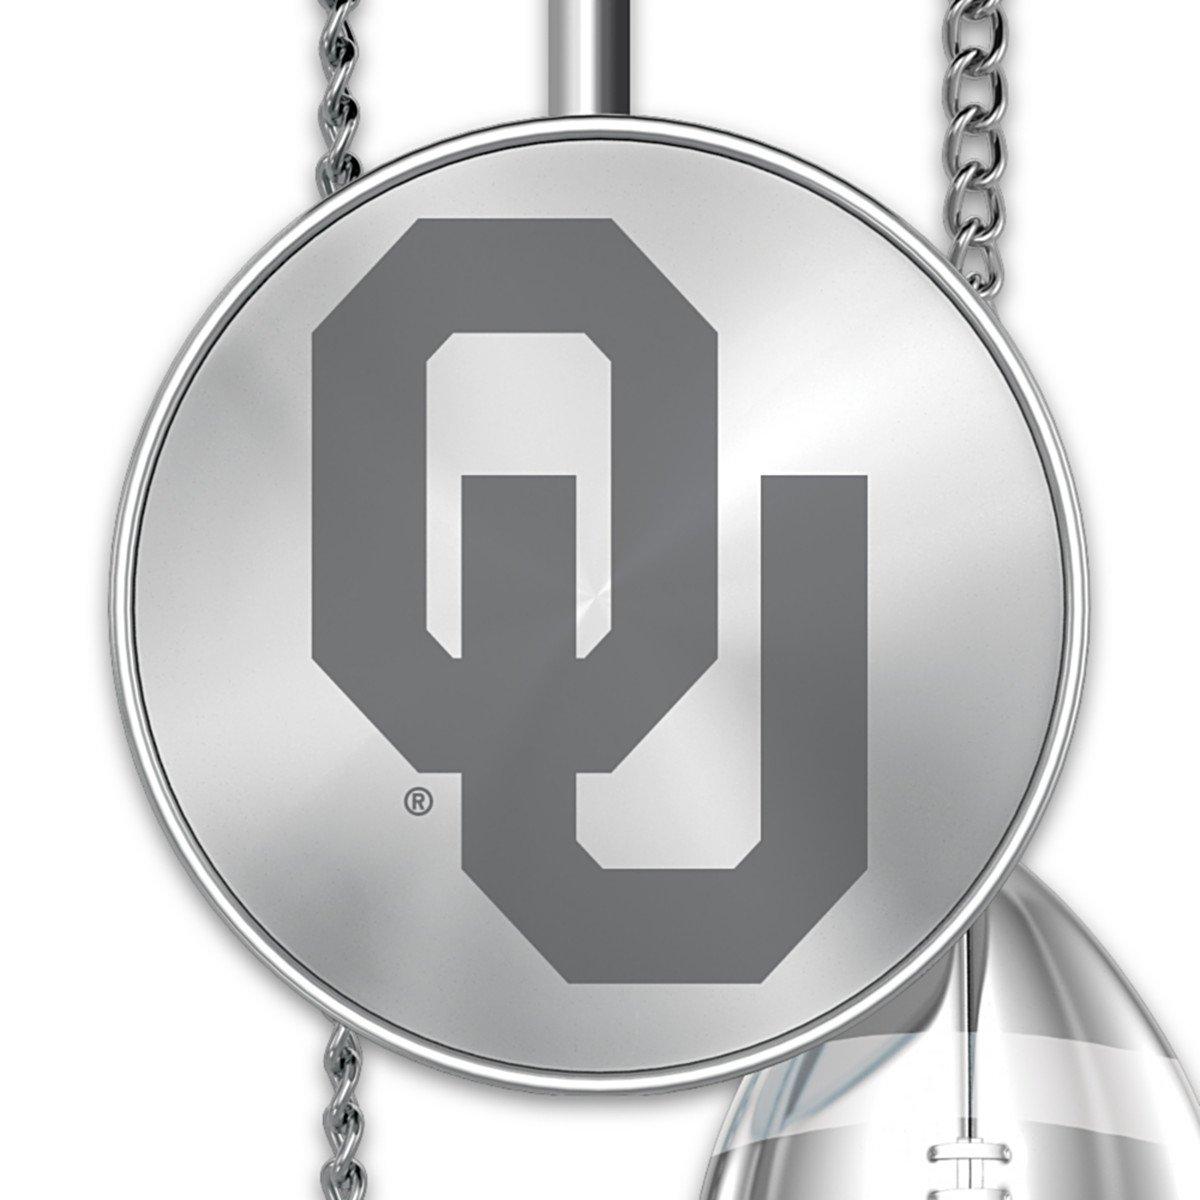 University Of Oklahoma Sooners College Football Cuckoo Clock: Bradford Exchange by The Bradford Exchange by Bradford Exchange (Image #5)